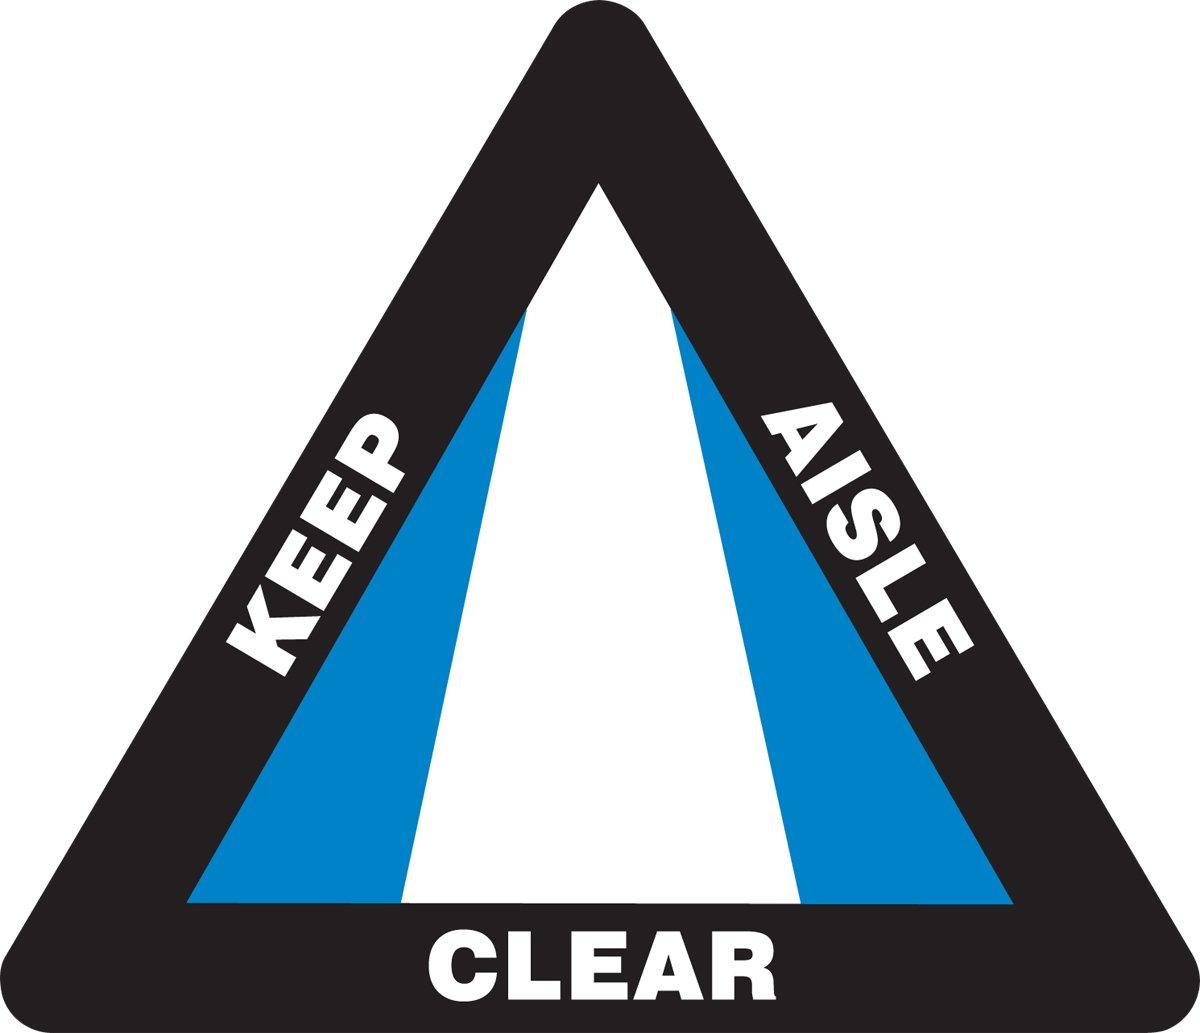 Accuform PSR823 Slip-Gard Adhesive Vinyl Triangle Shape Floor Sign, Legend''KEEP AISLE CLEAR'', 15'' Length x 17'' Width, Blue/Black/White